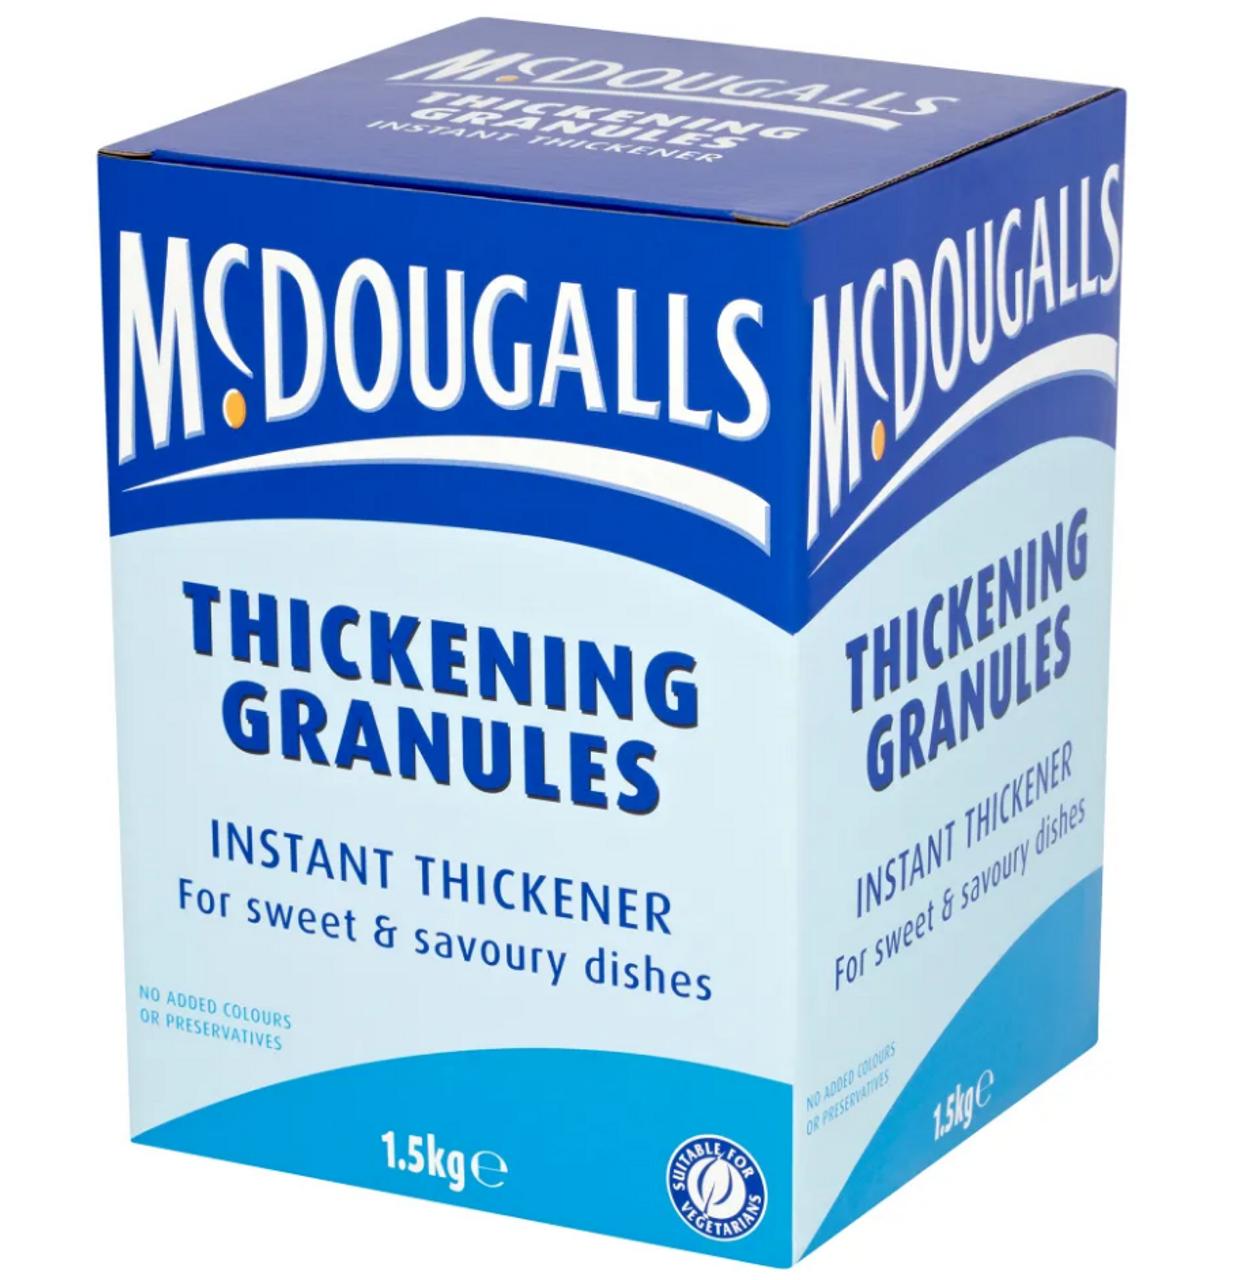 McDOUGALLS - THICKENING GRANULES - 1.5KG